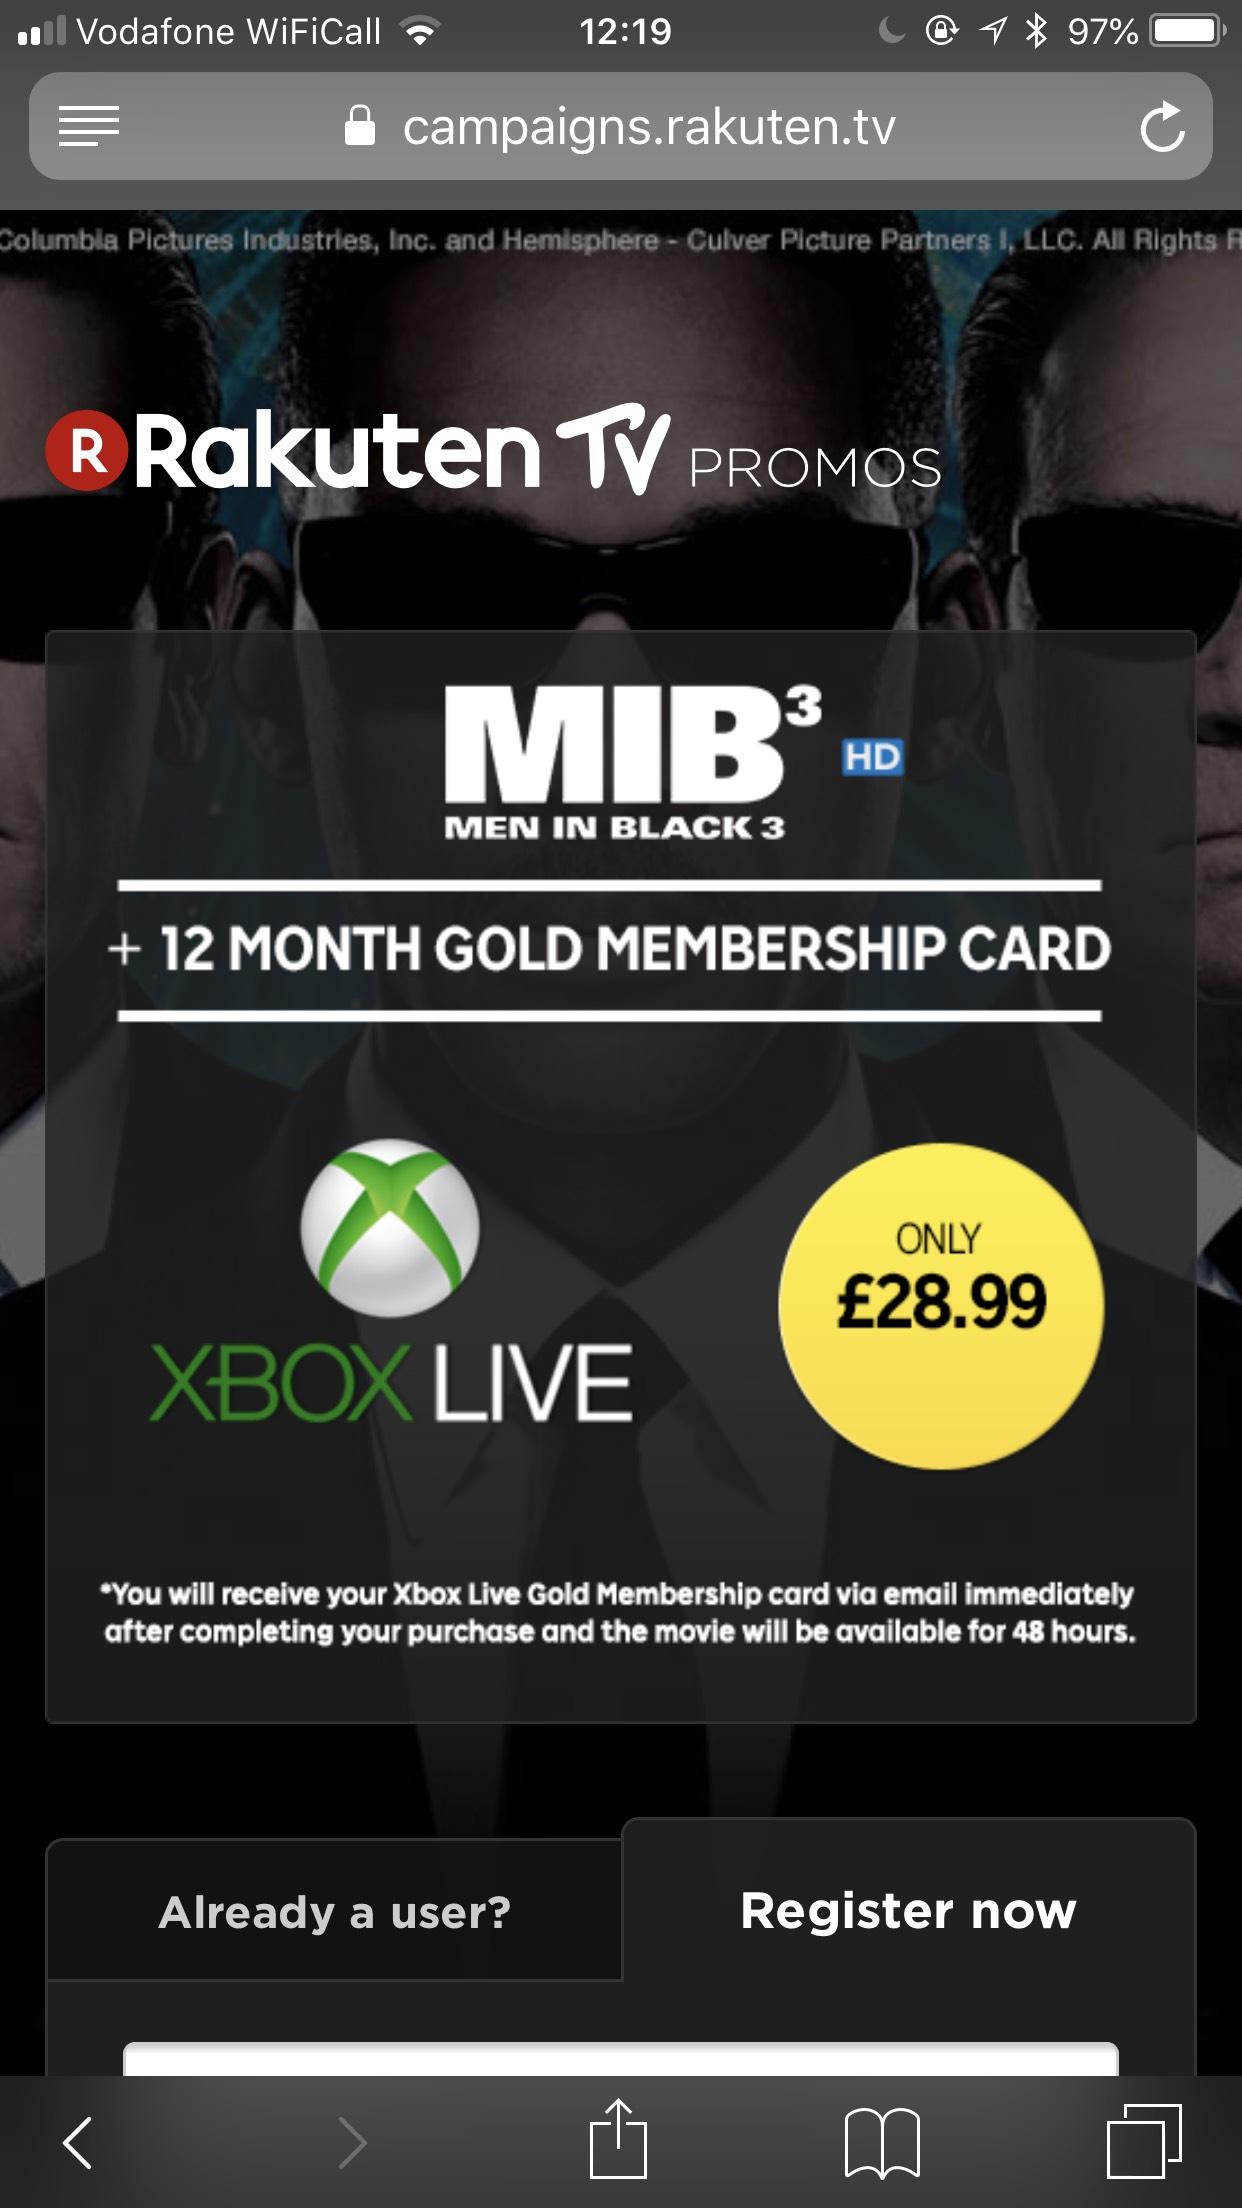 Xbox Live Gold 12 Month + Men in Black 3 HD Rental - £28.99 @ Rakuten